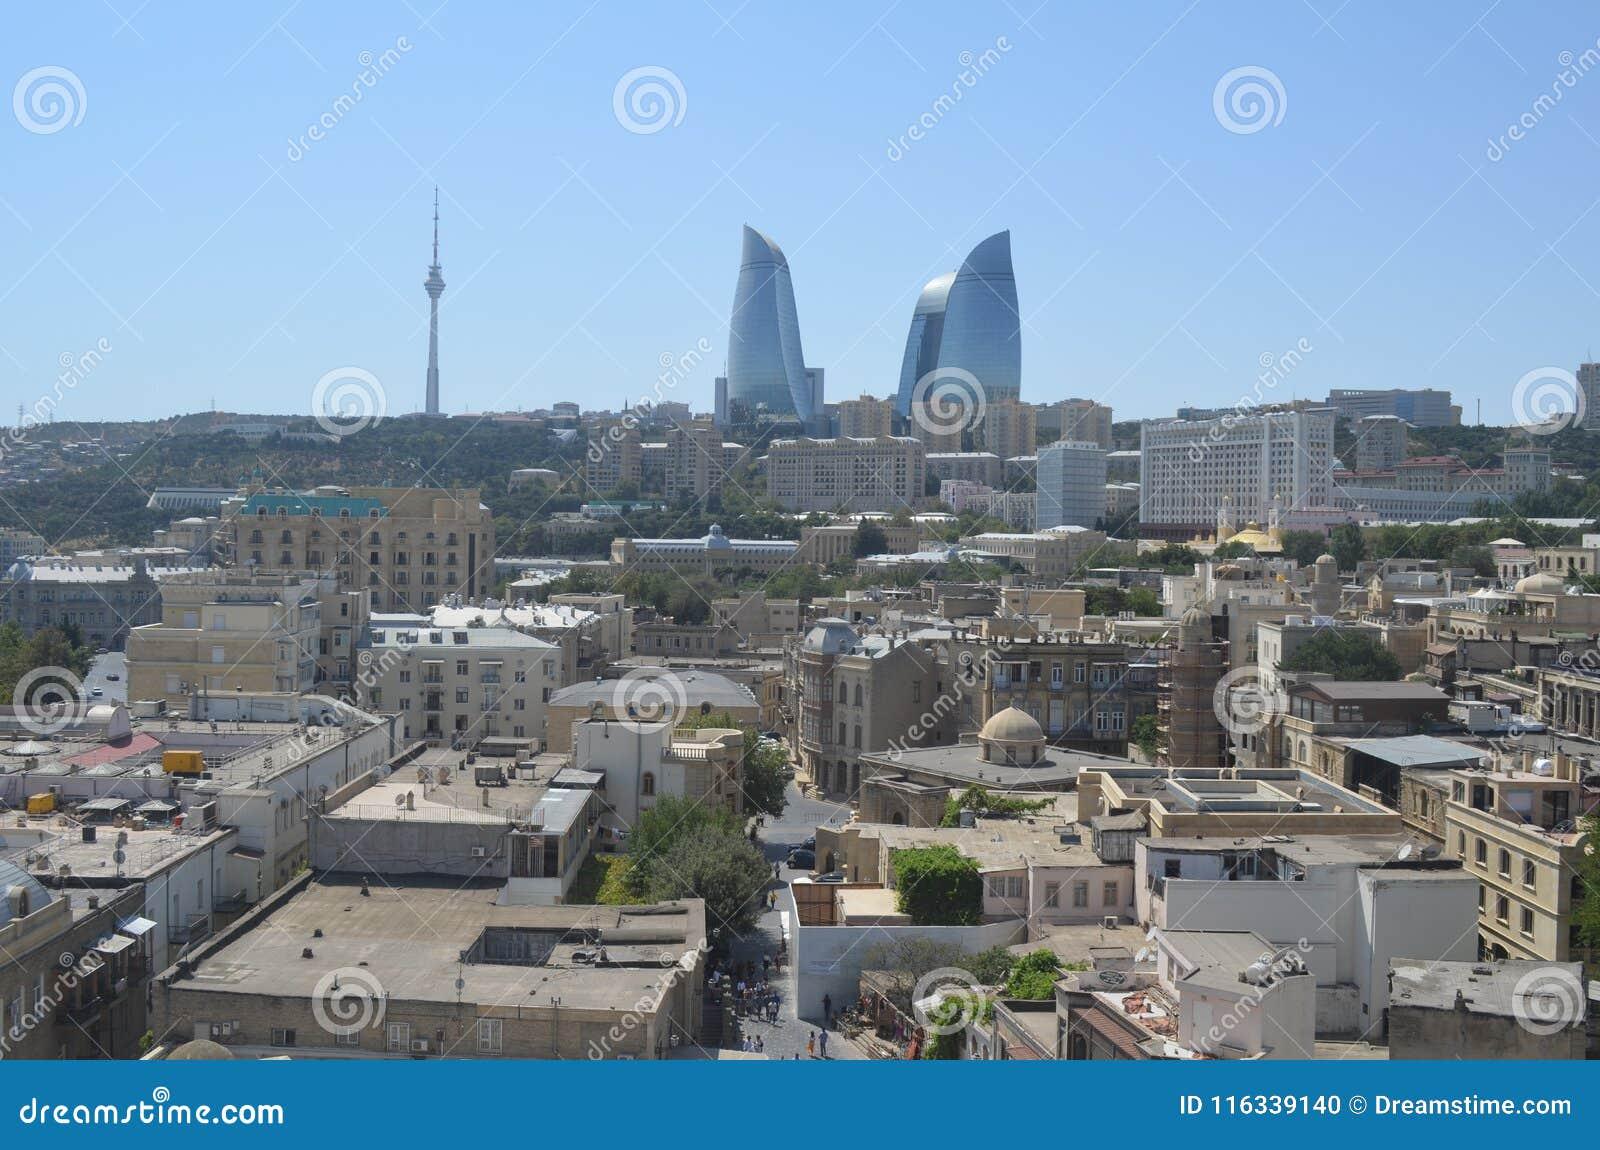 Skyline of Baku City, Capital of Azerbaijan at the Caspian Sea